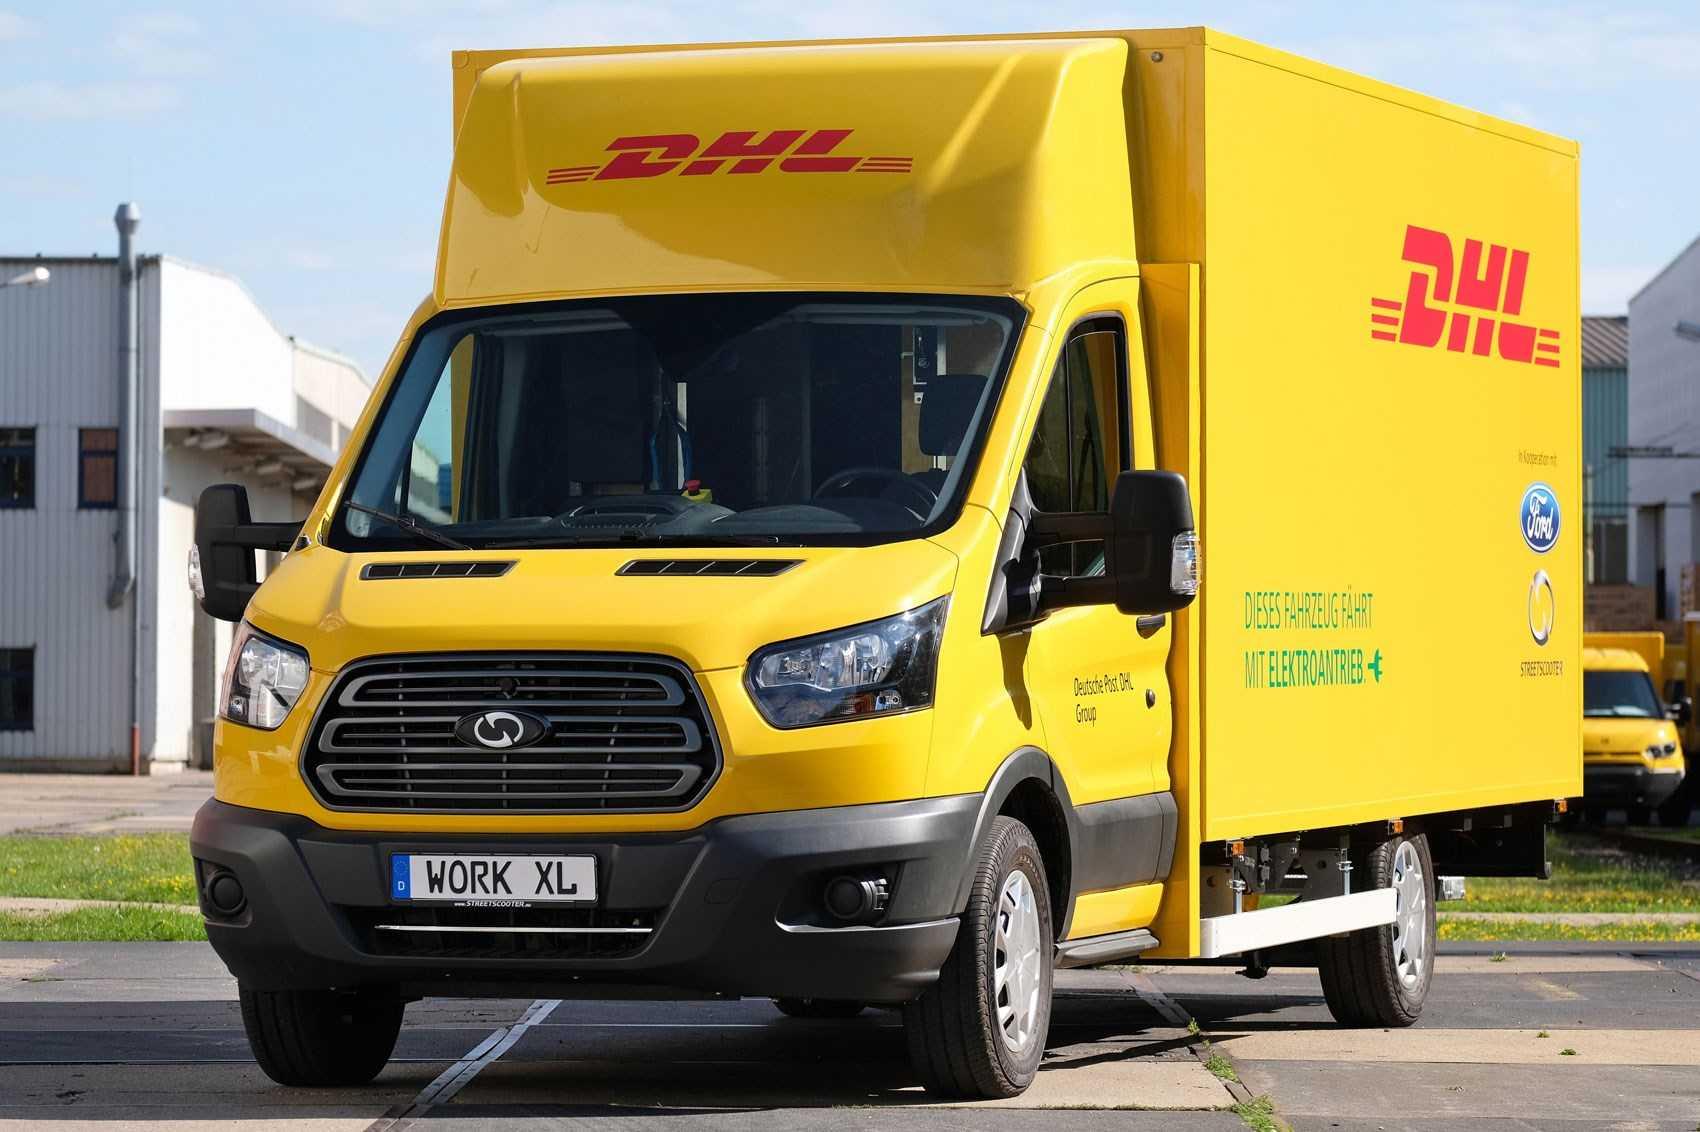 Ford e-transit 2022— новый электрический фургон (350 км без подзарядки)